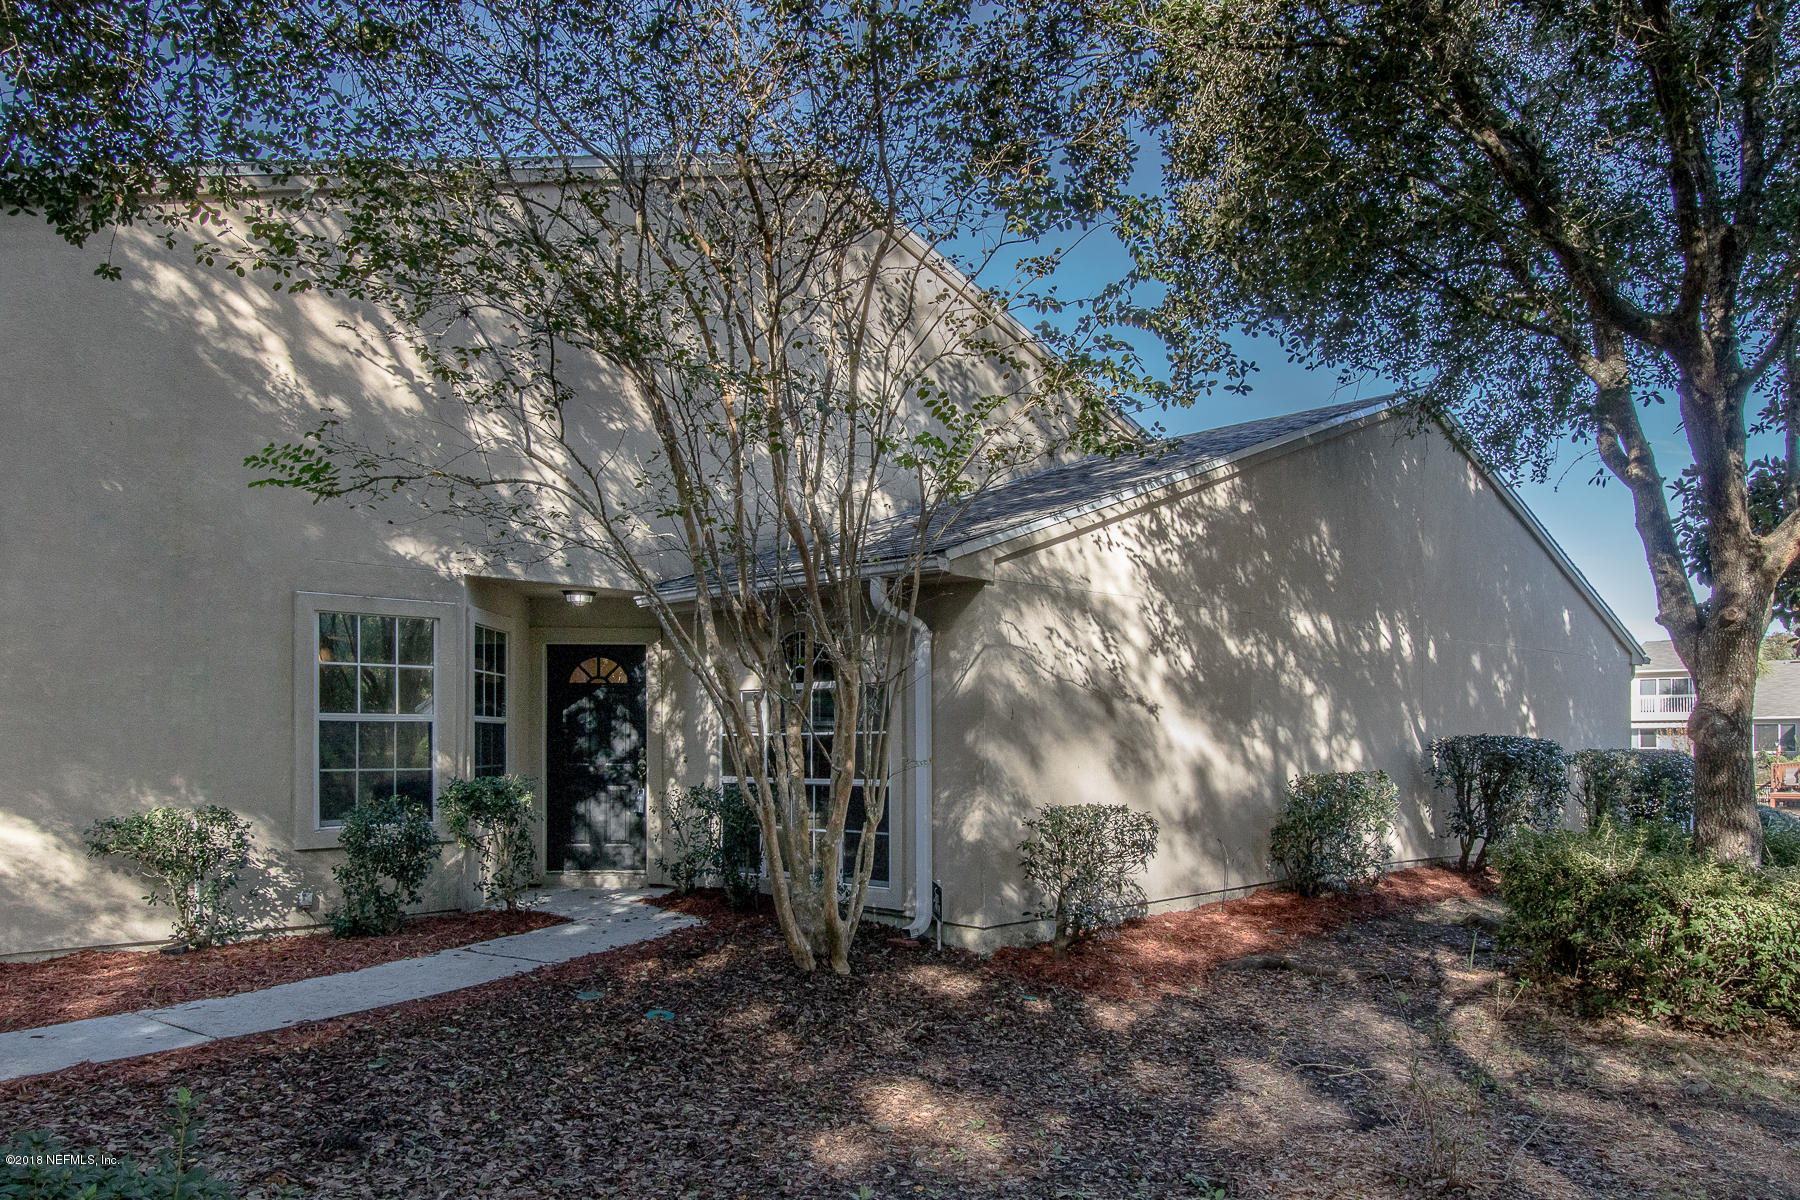 49 FOX VALLEY, ORANGE PARK, FLORIDA 32073, 3 Bedrooms Bedrooms, ,2 BathroomsBathrooms,Residential - townhome,For sale,FOX VALLEY,968324